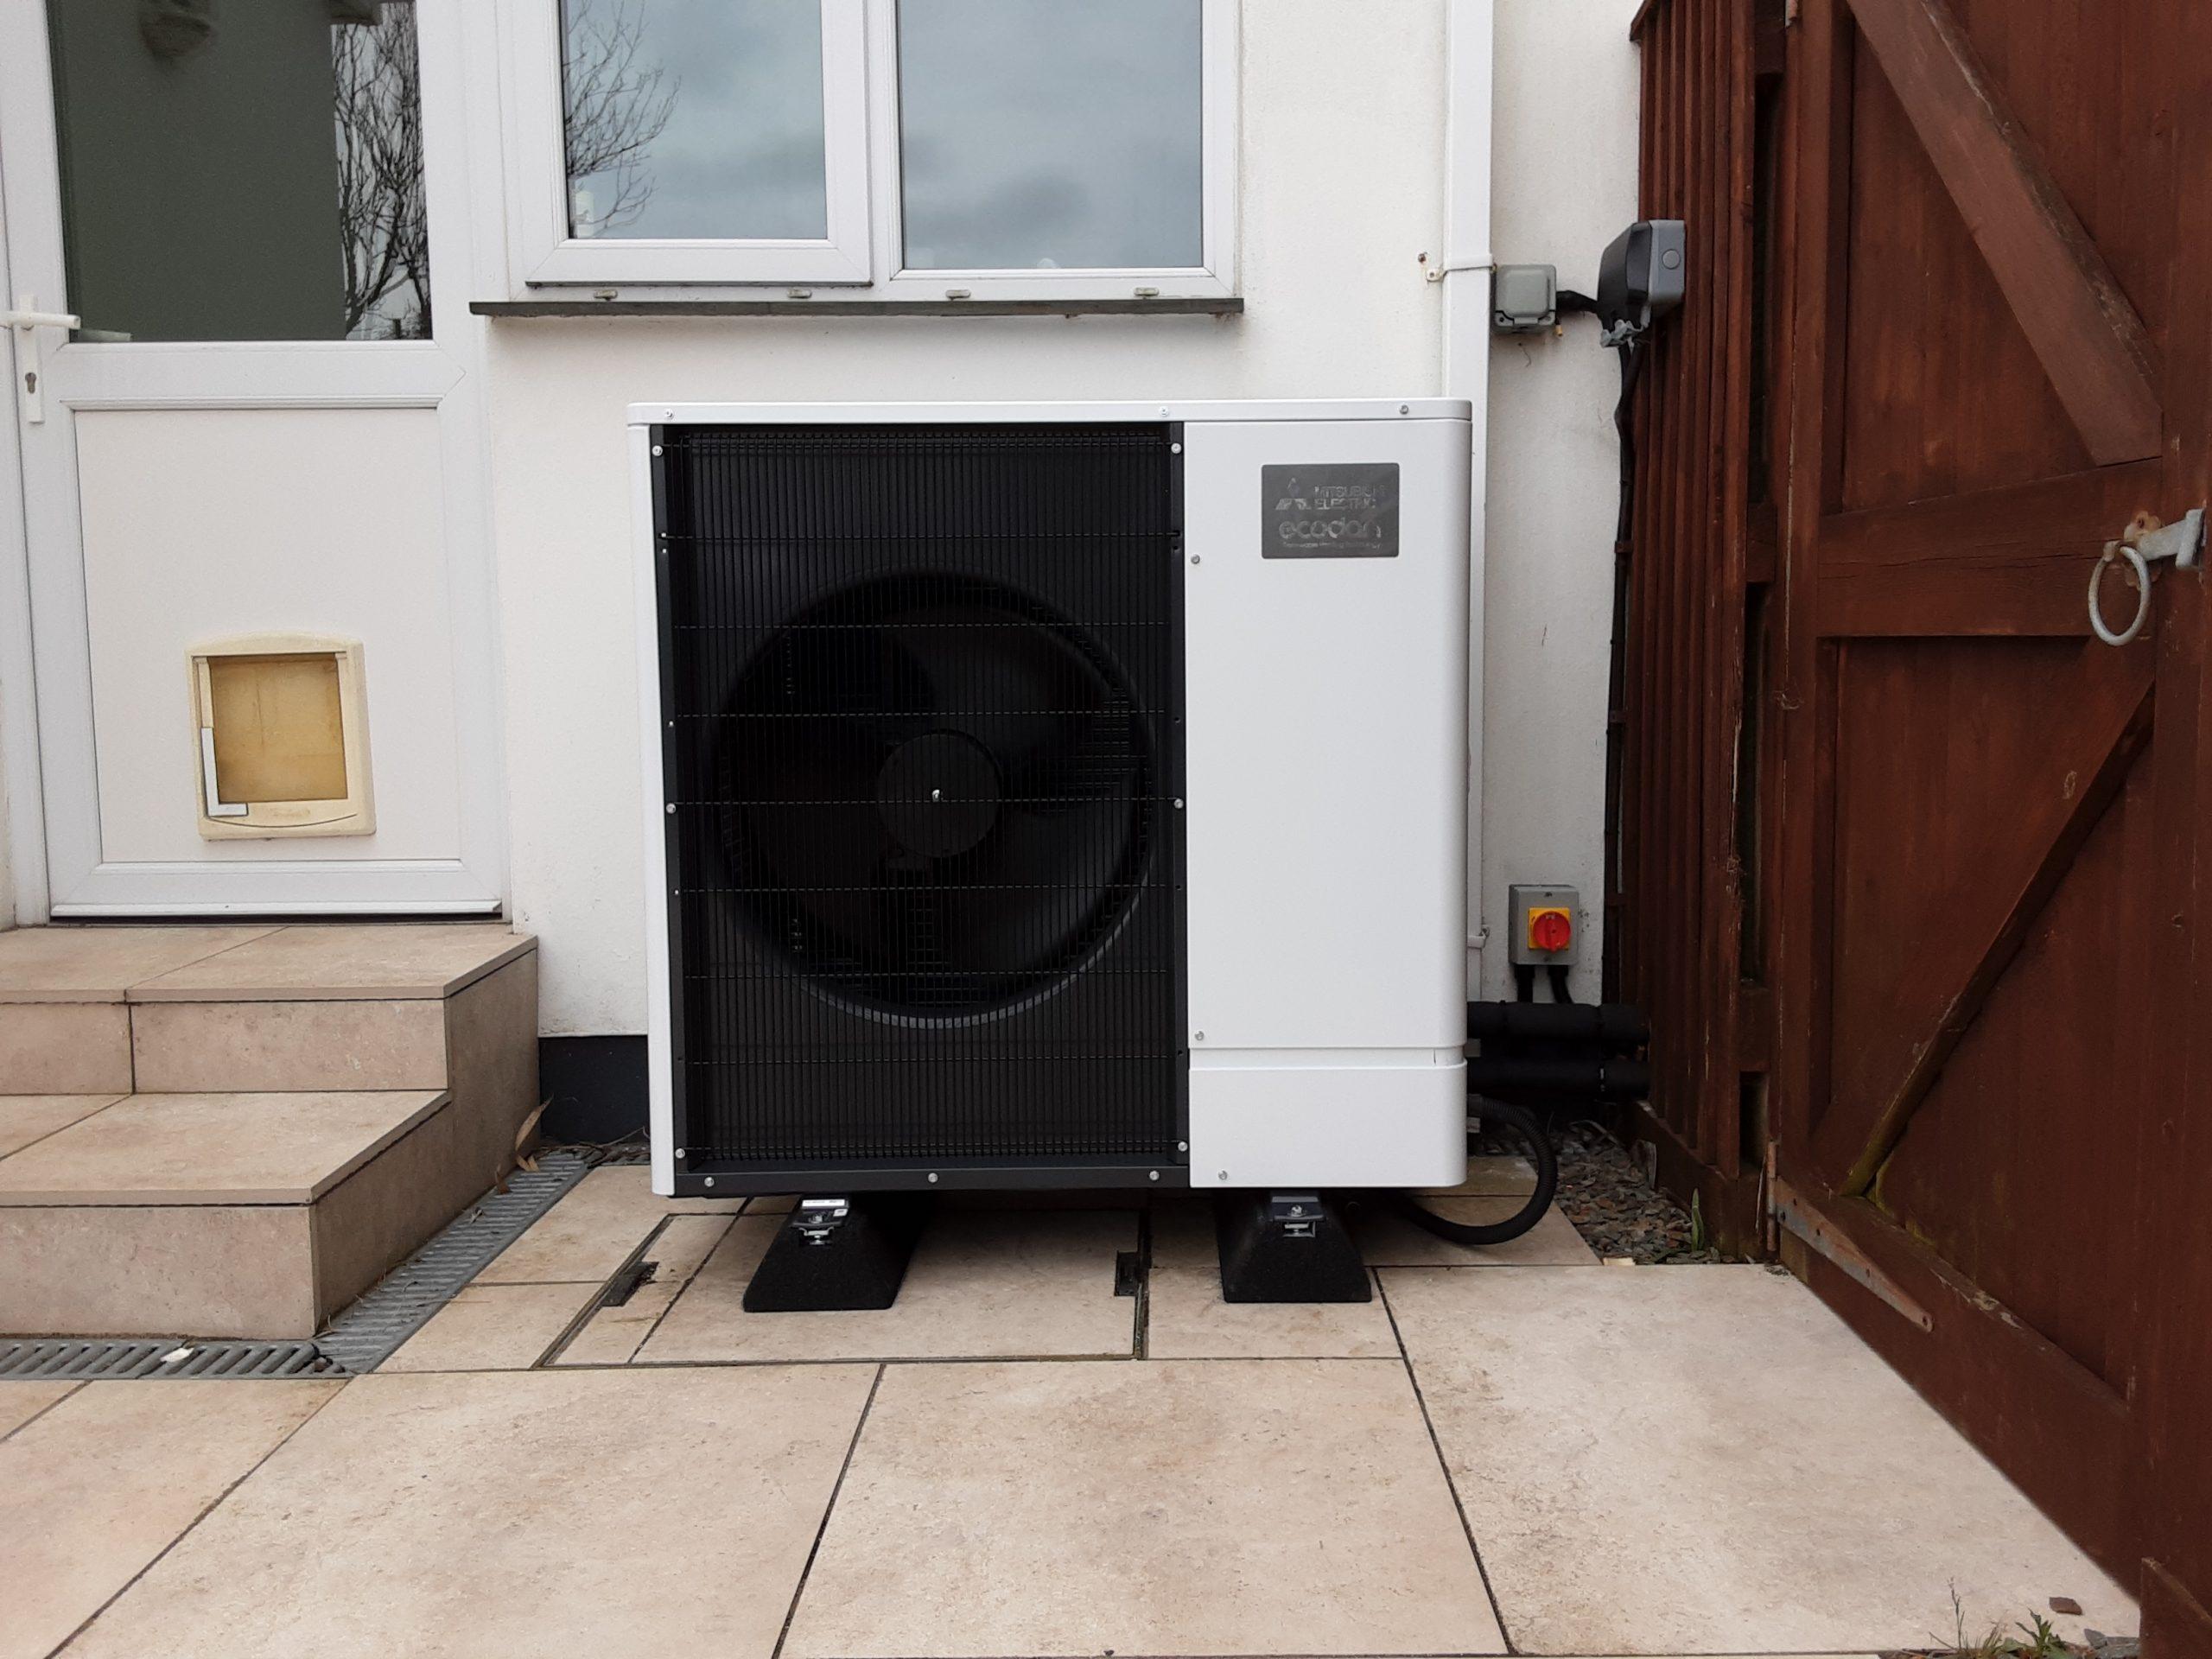 An 85kW Mitsubishi Ecodan ultra quiet air source heat pump installation by GreenGenUK in Cornwall.